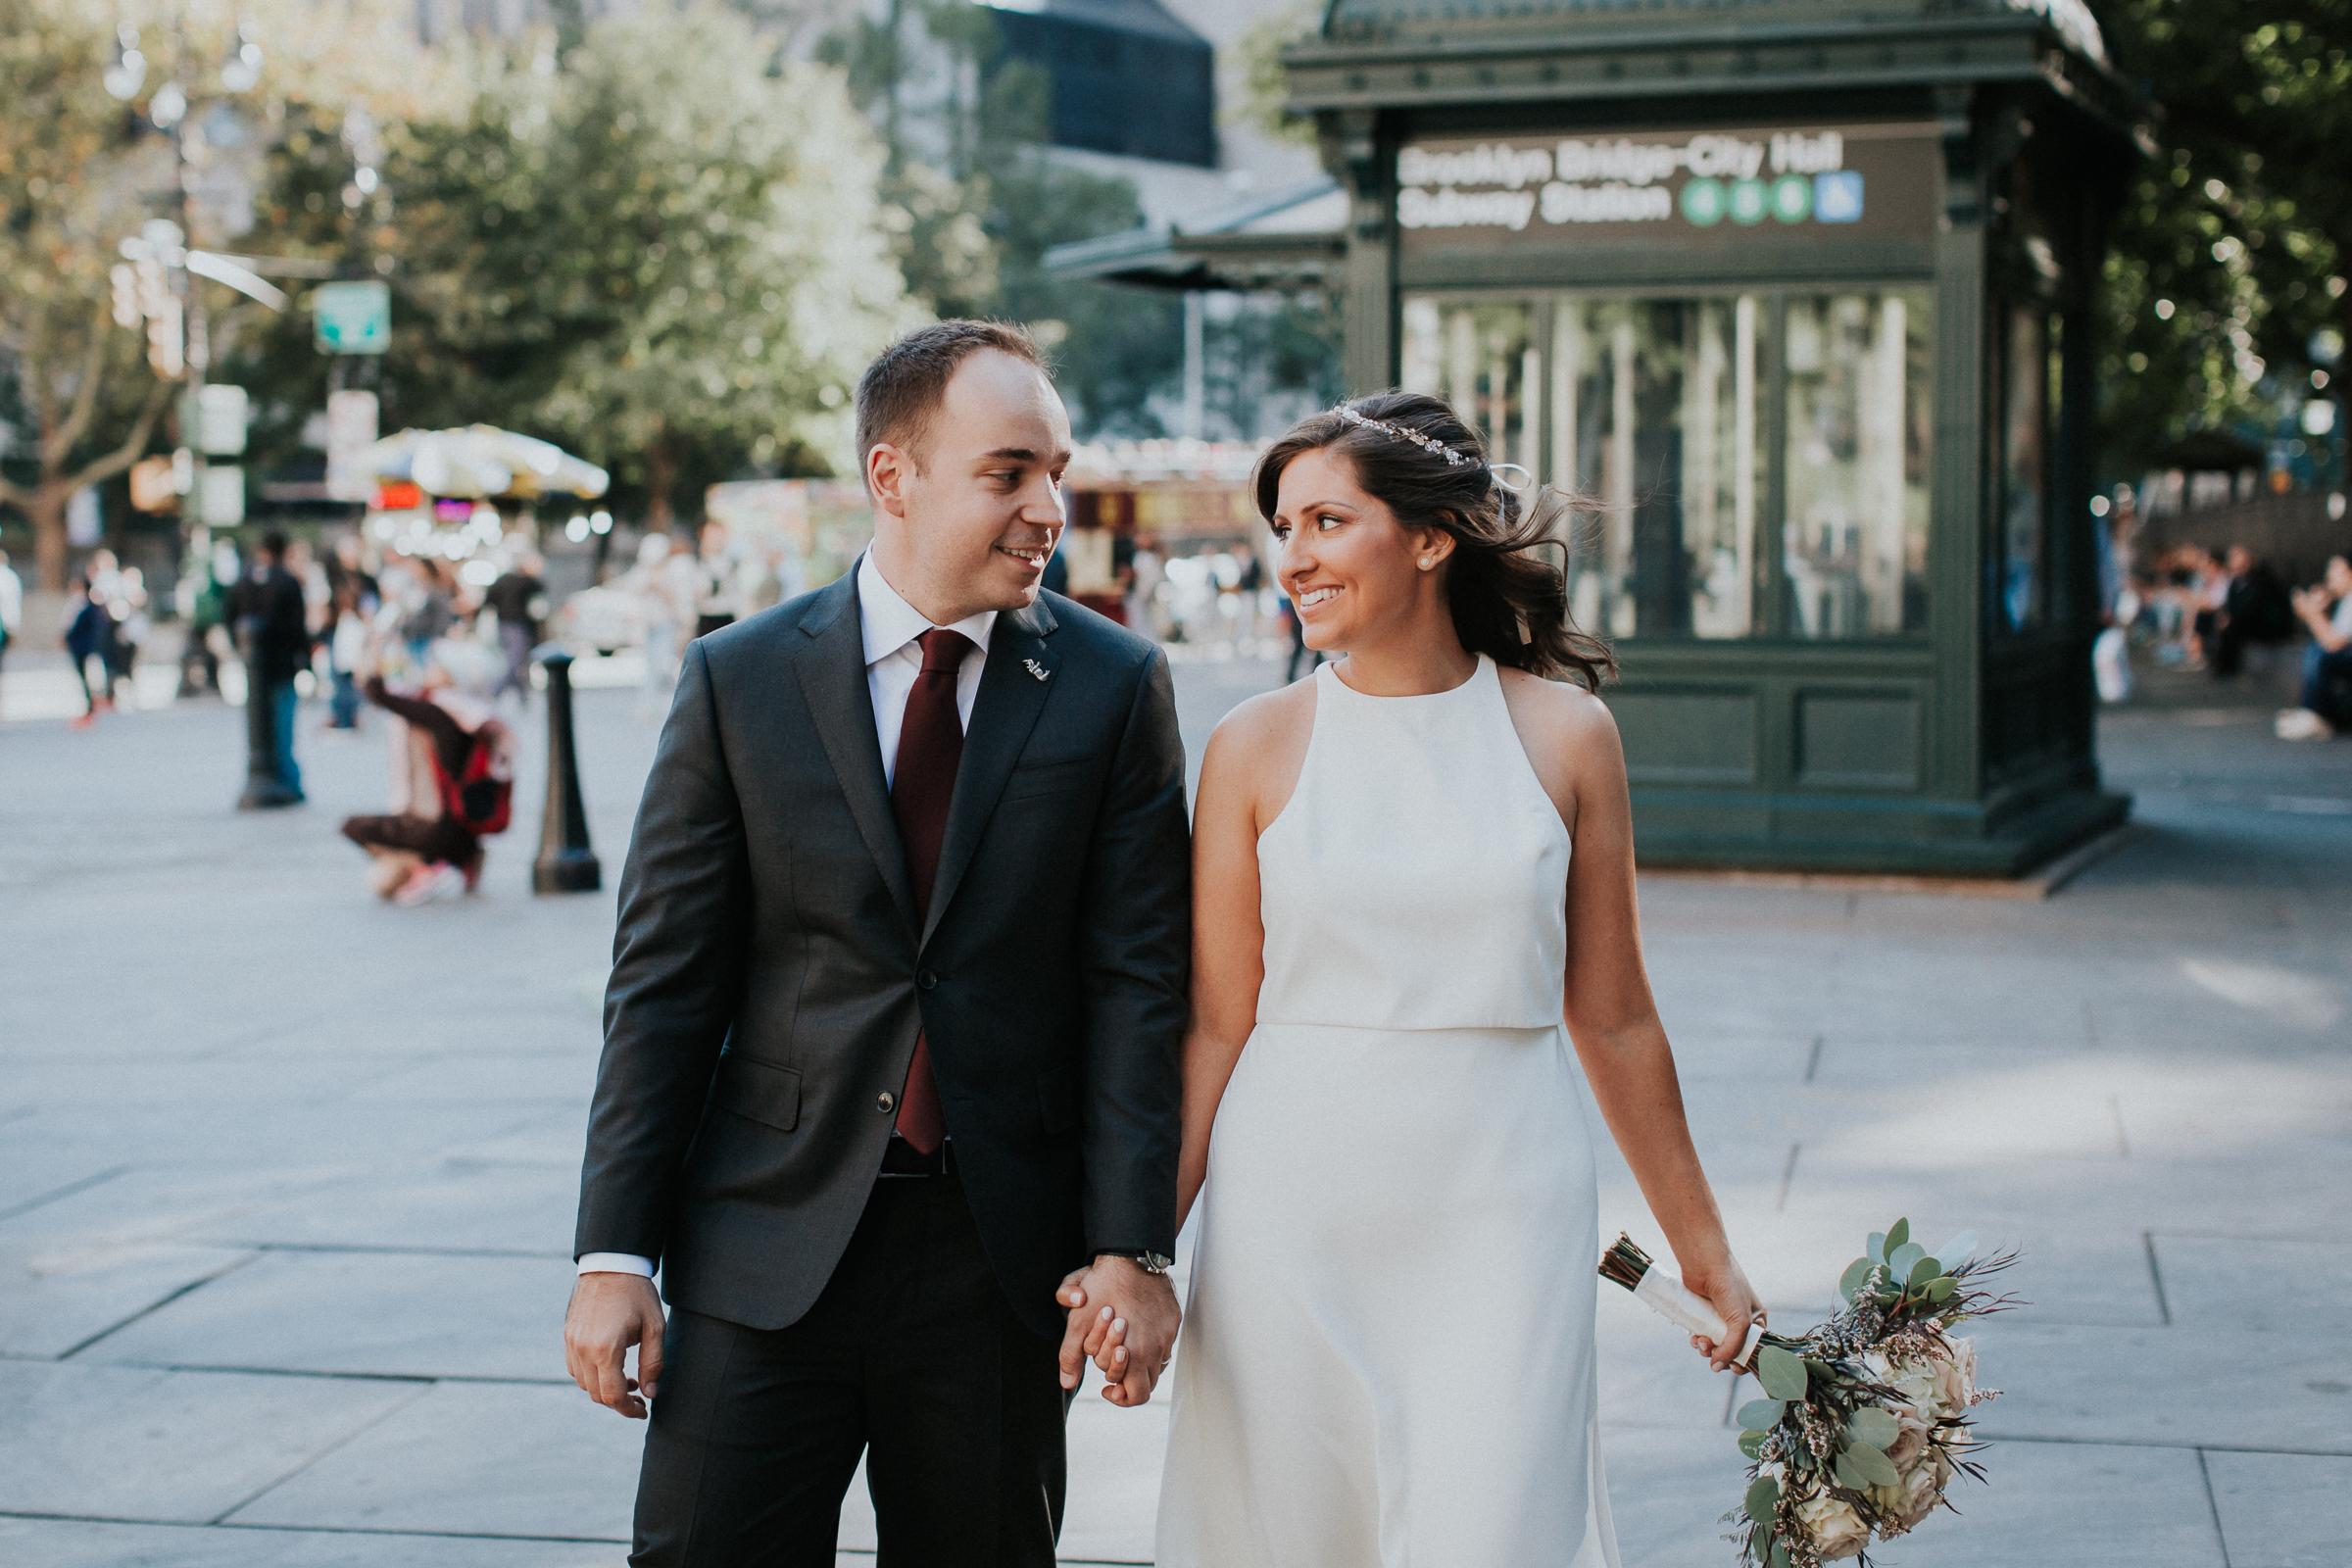 Casa-Apicii-Intimate-Wedding-City-Hall-Elopement-New-York-Documentary-Wedding-Photographer-23.jpg